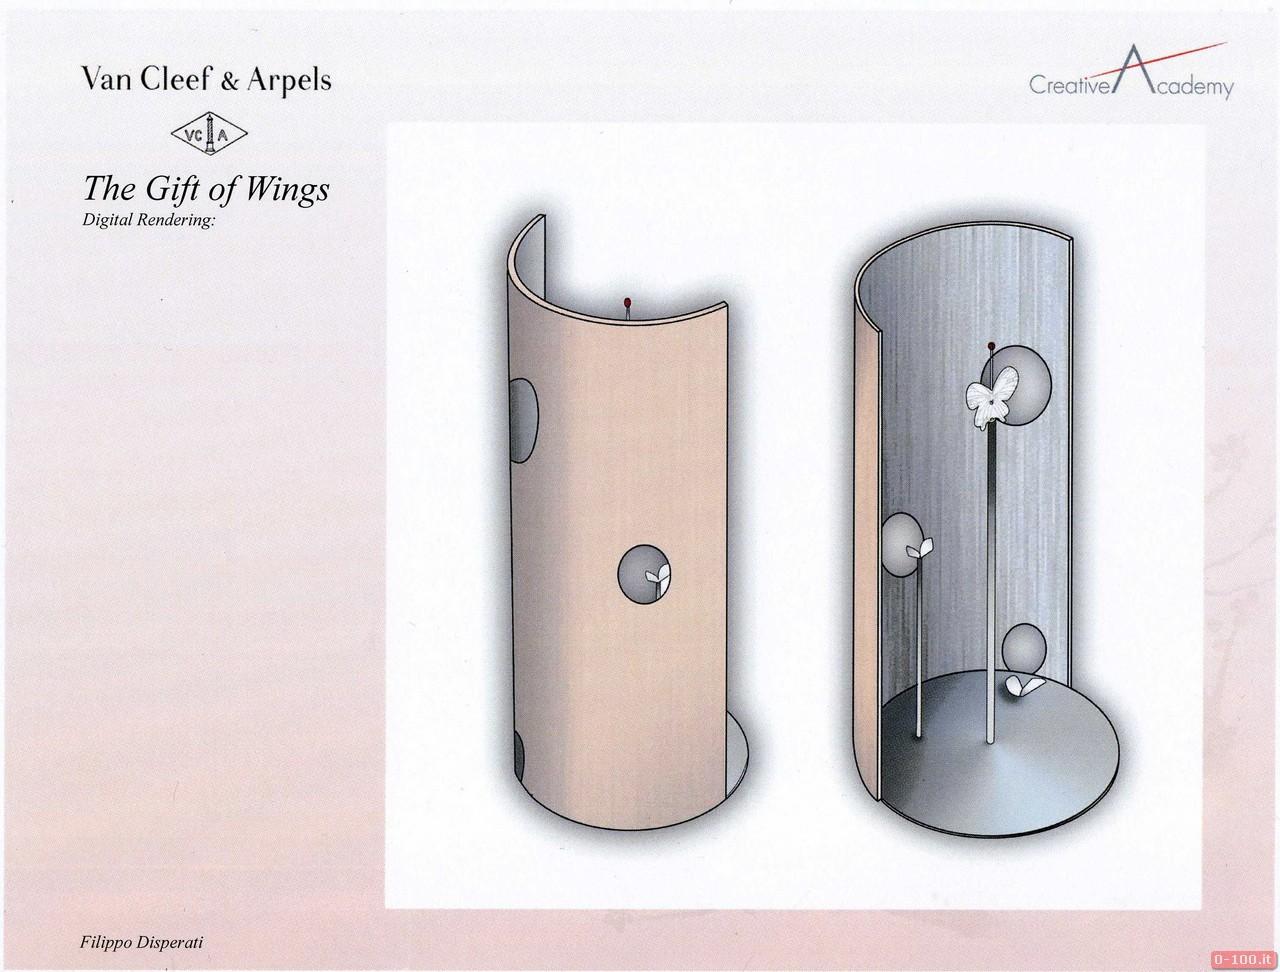 Blooming Creativity_The Gift of Wings - Filippo Disperati _Van Cleef & Arpels_0-100 3